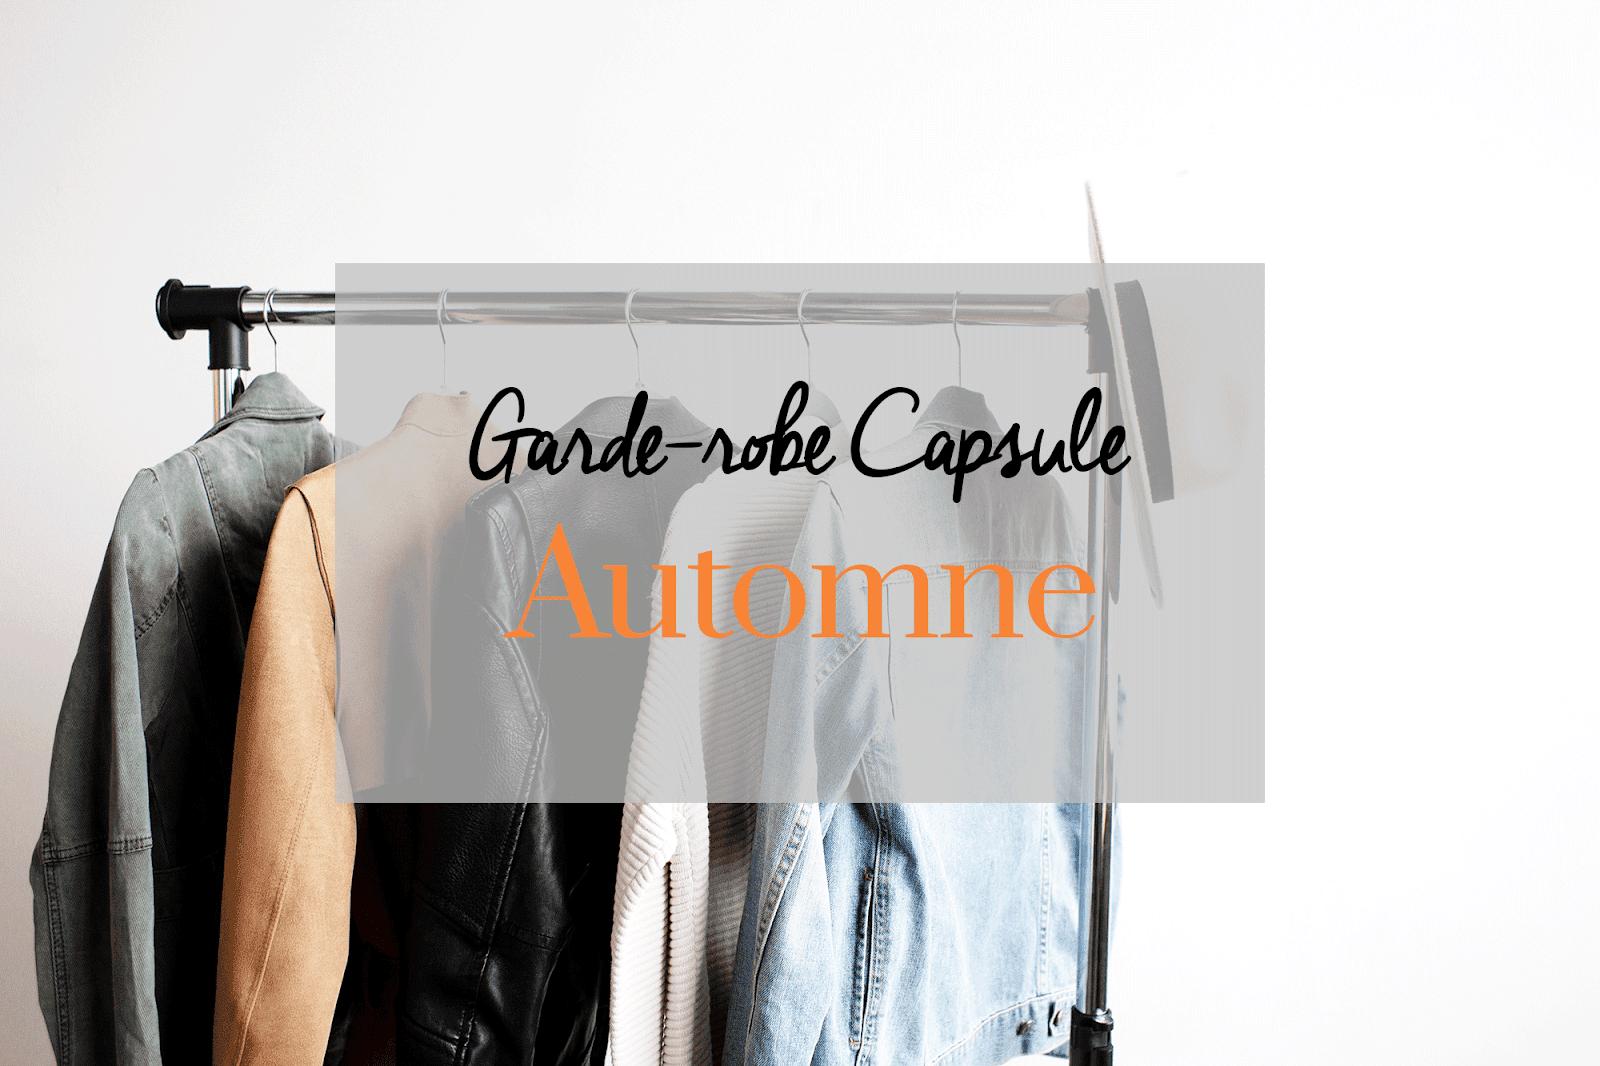 Garde-robe Capsule Automne Starter Kit